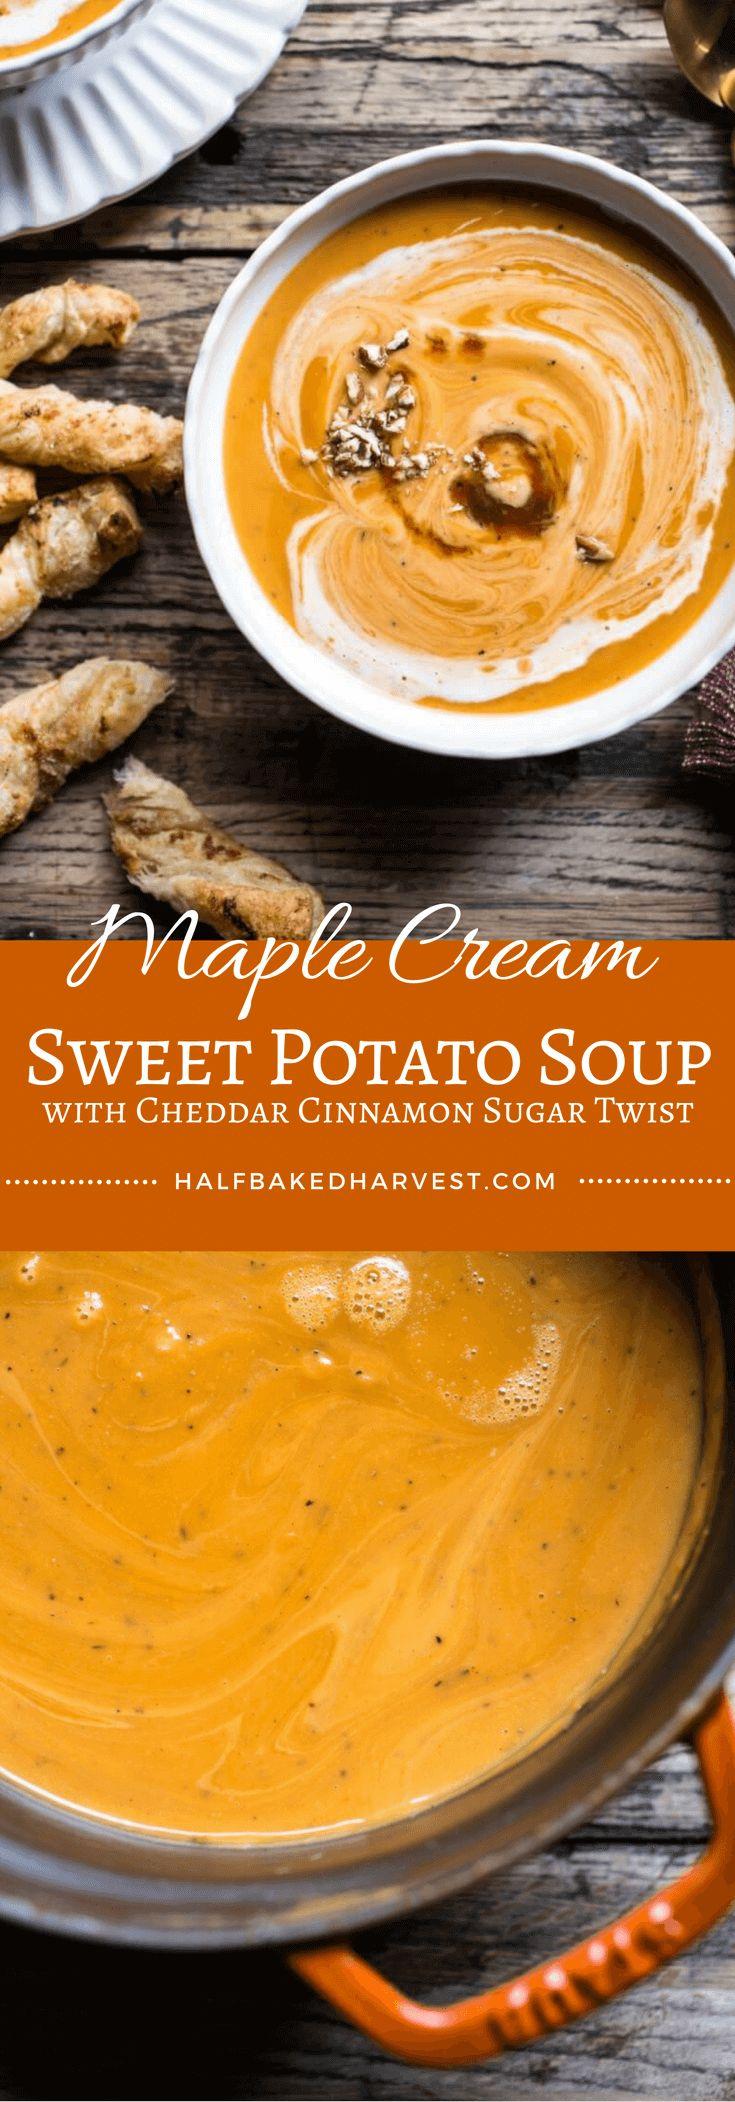 Maple Cream Sweet Potato Soup with Cheddar Cinnamon Sugar Twist   halfbakedharvest.com @hbharvest